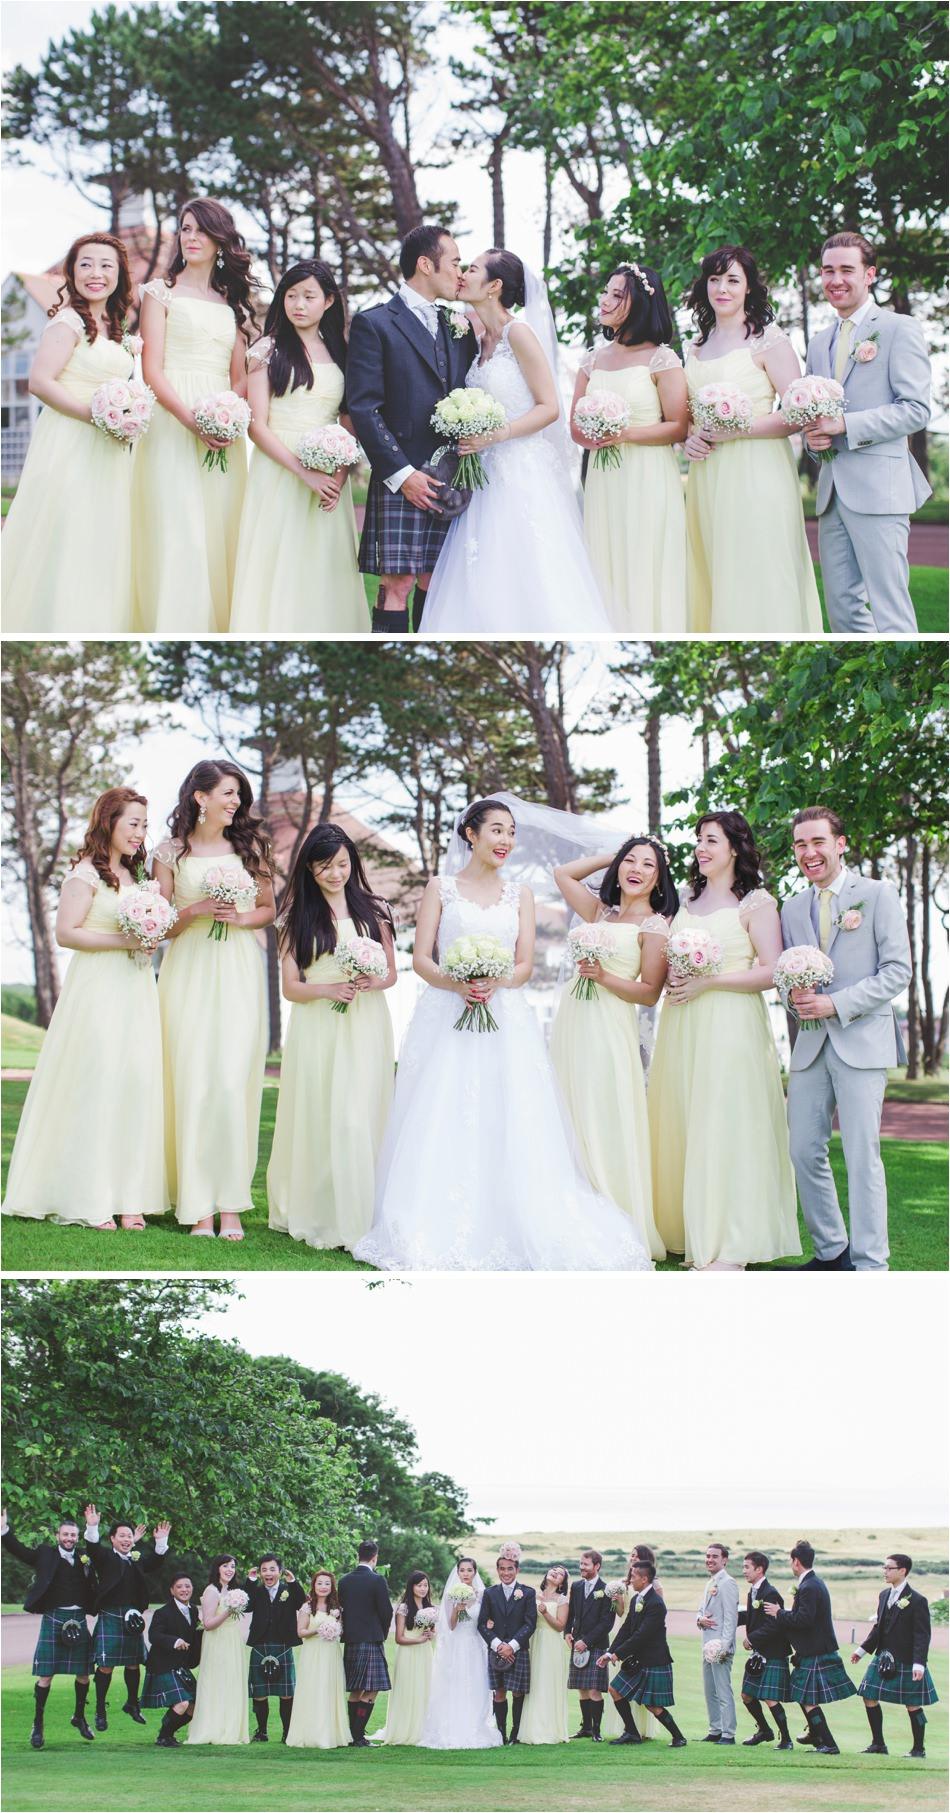 fine art wedding photographers scotland glasgow 5-8.jpg